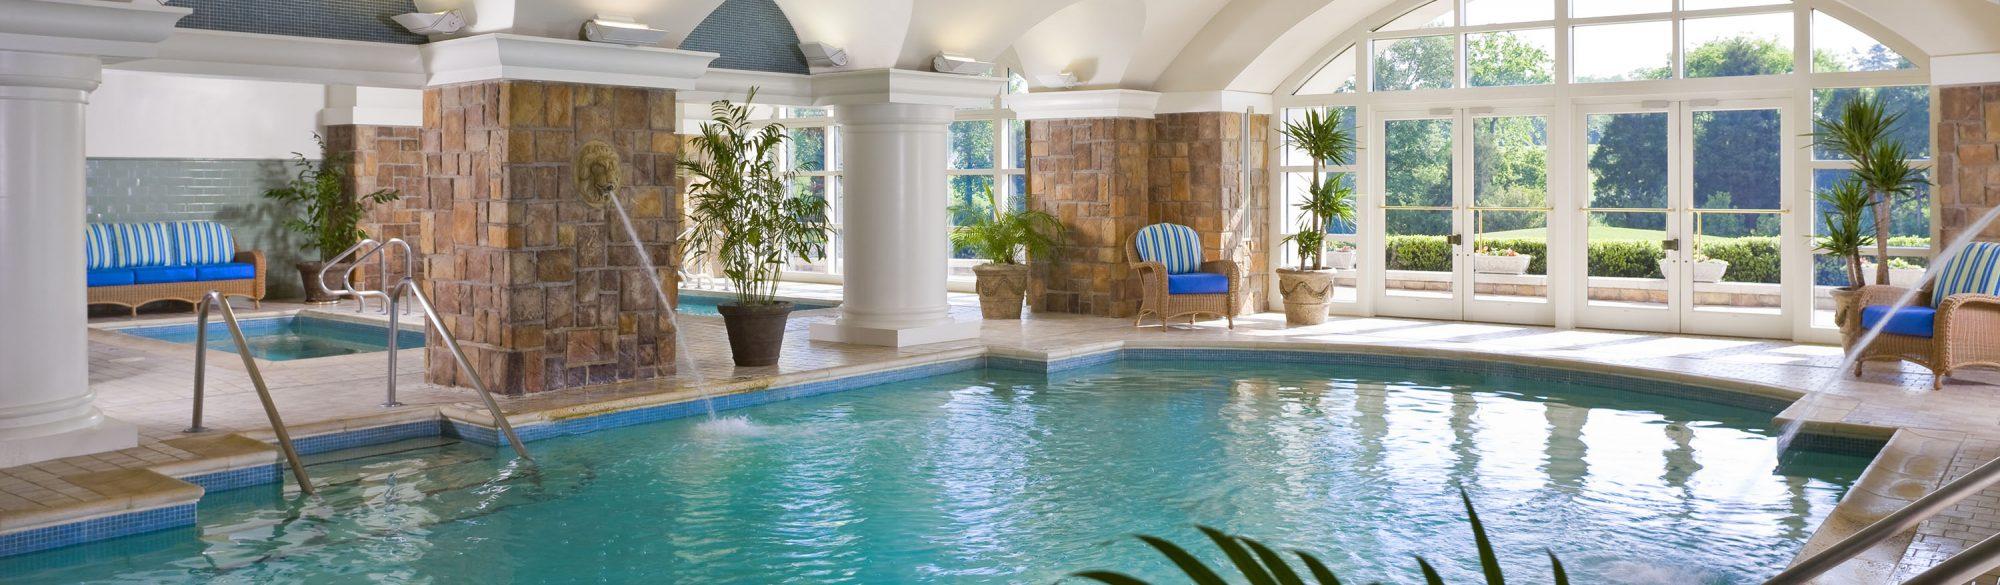 Indoor Pools at The Ballantyne, Charlotte